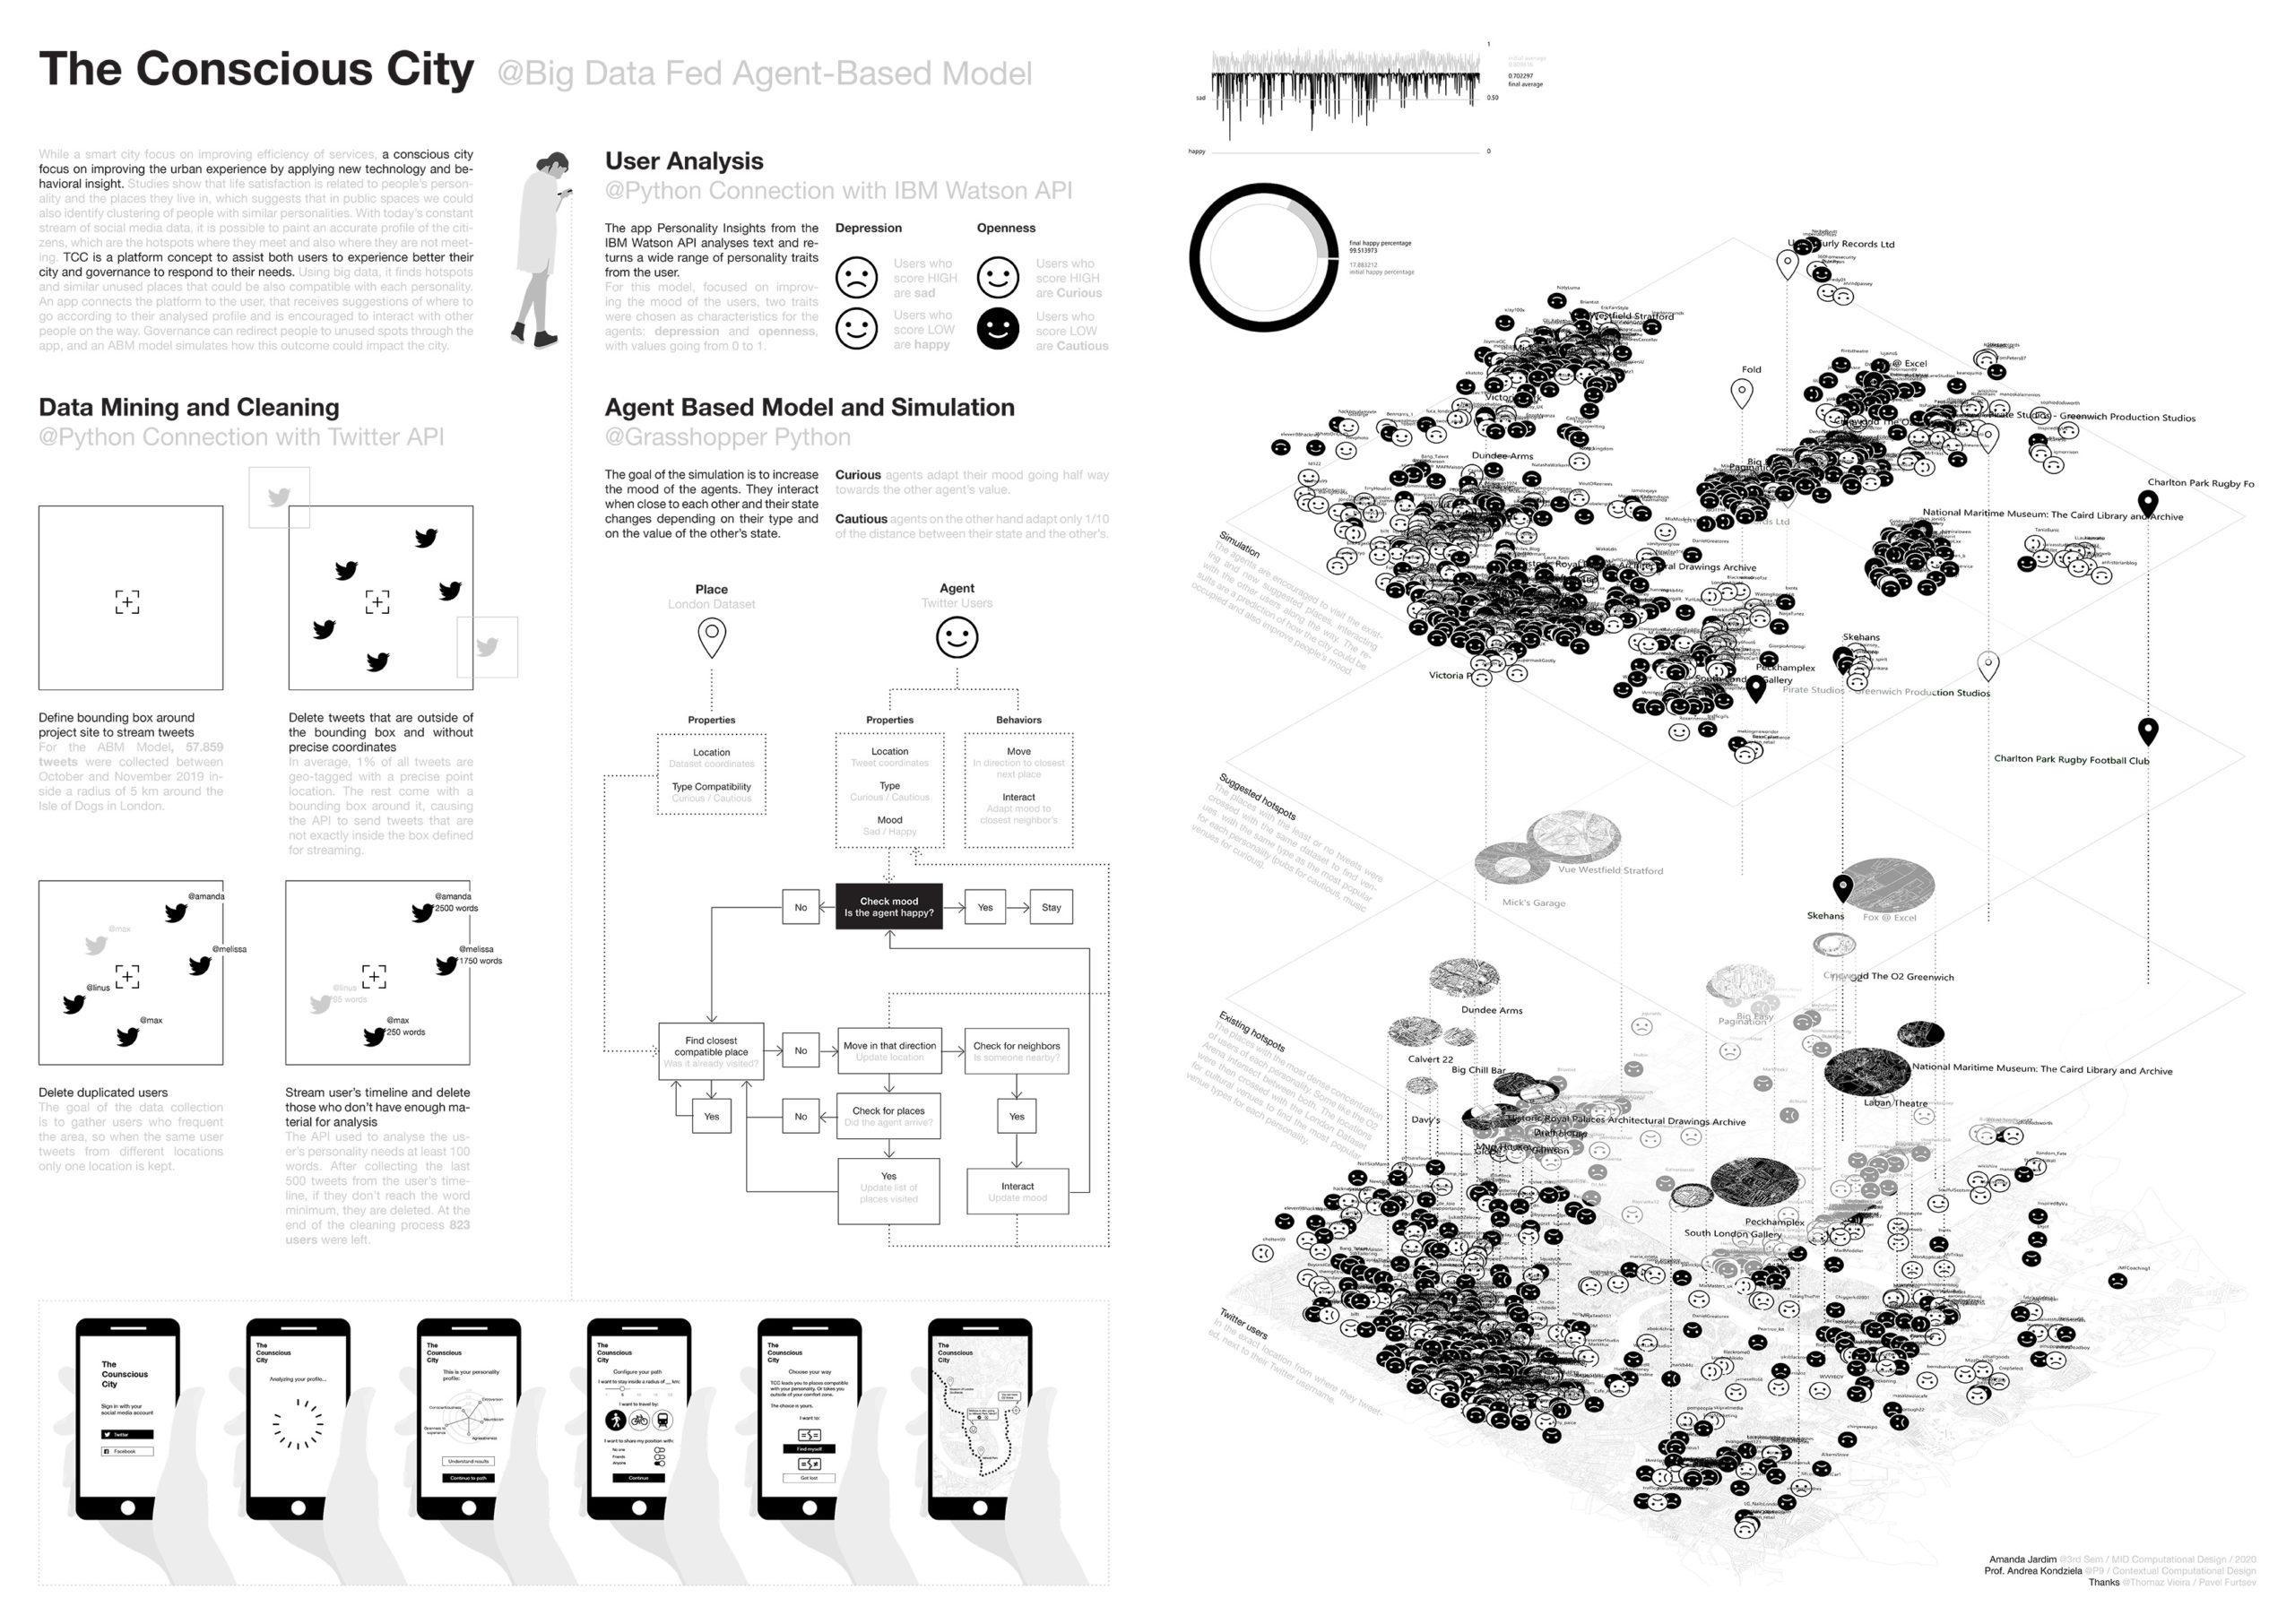 The Conscious City (Amanda Jardim)